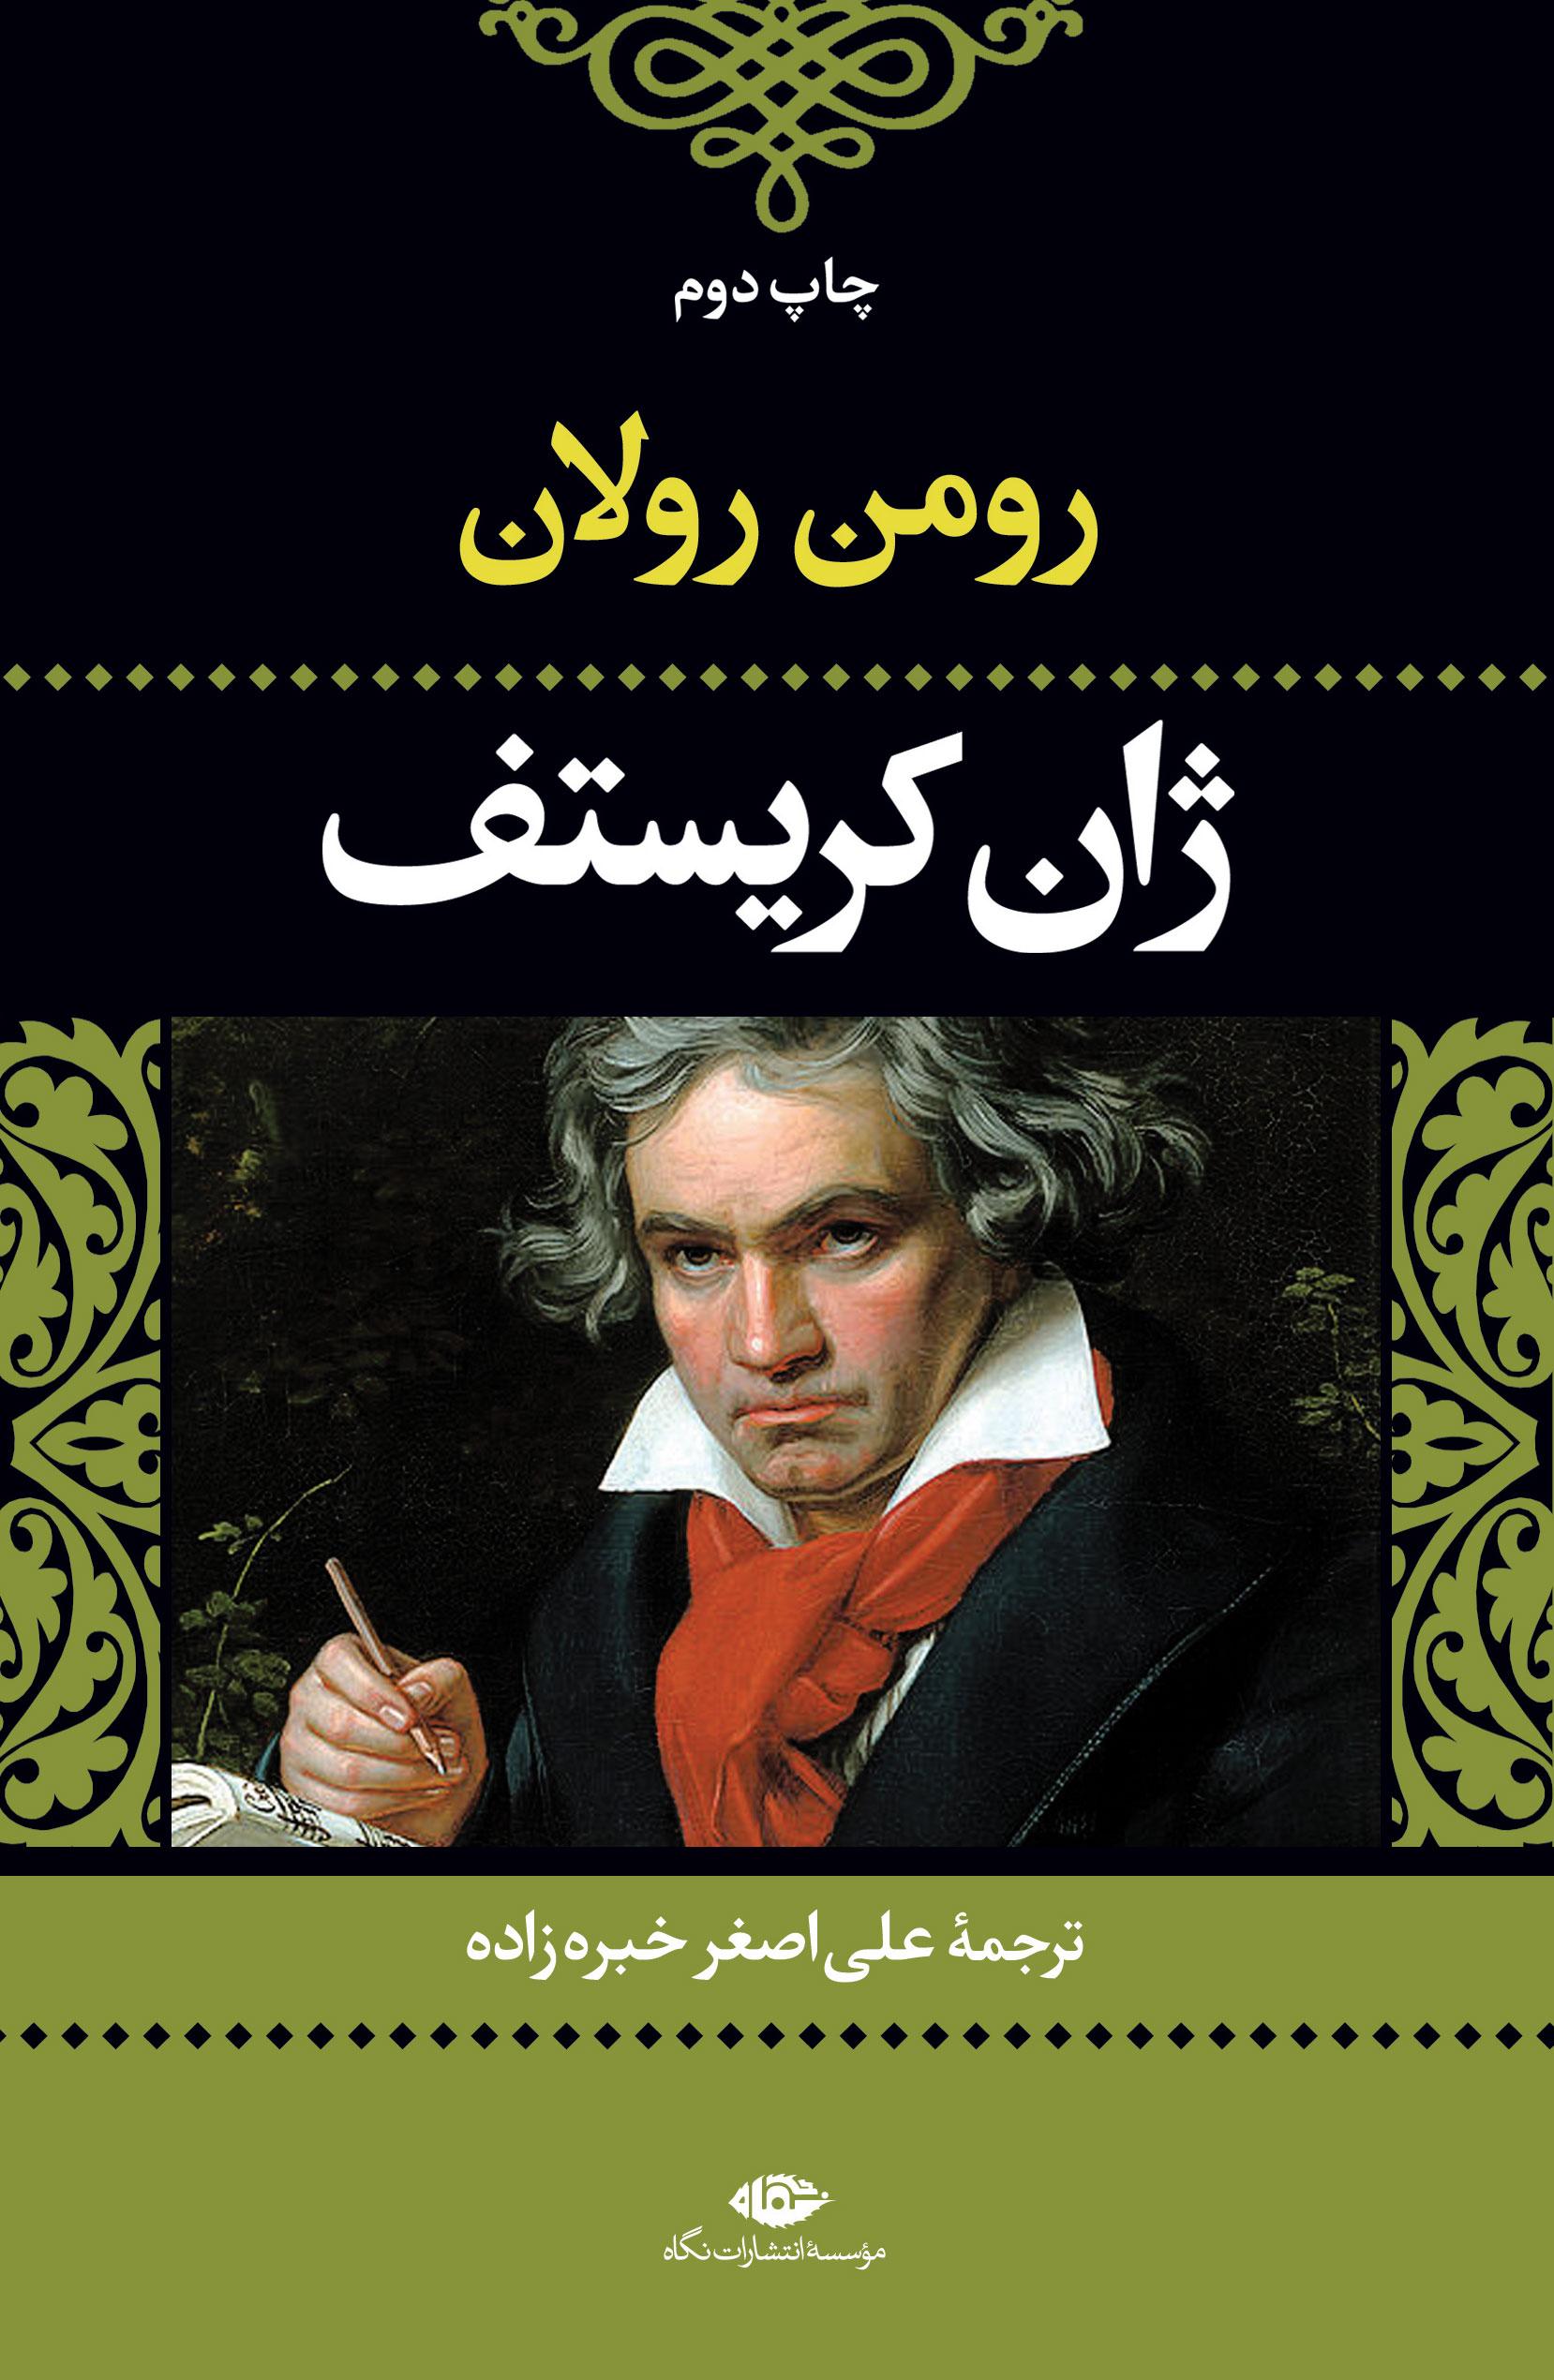 کتاب ژان کریستف (۲ جلدی)